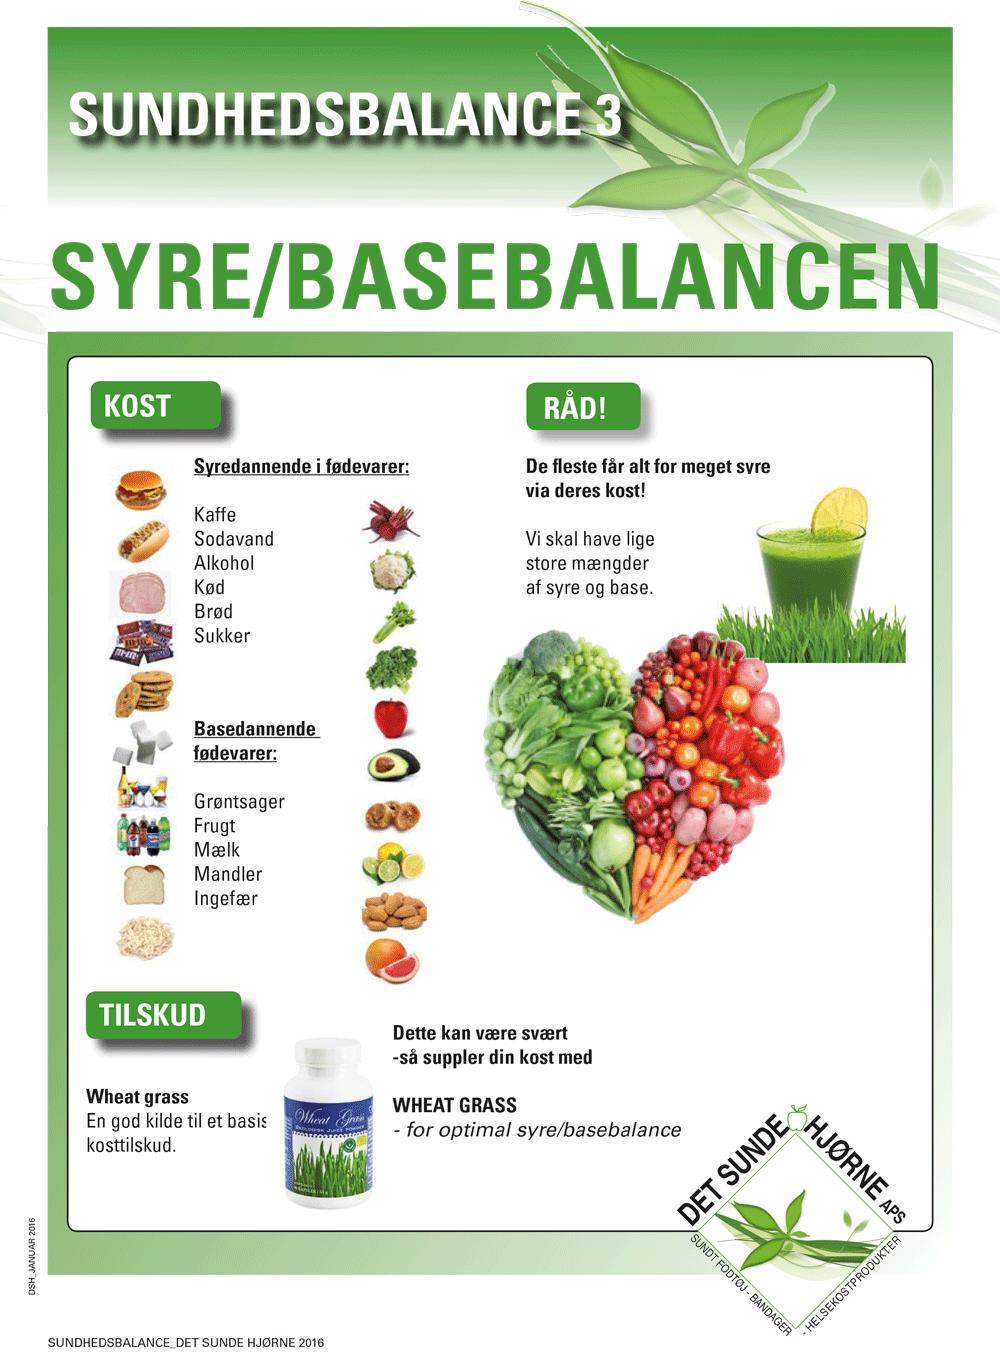 syre i kroppen symptomer